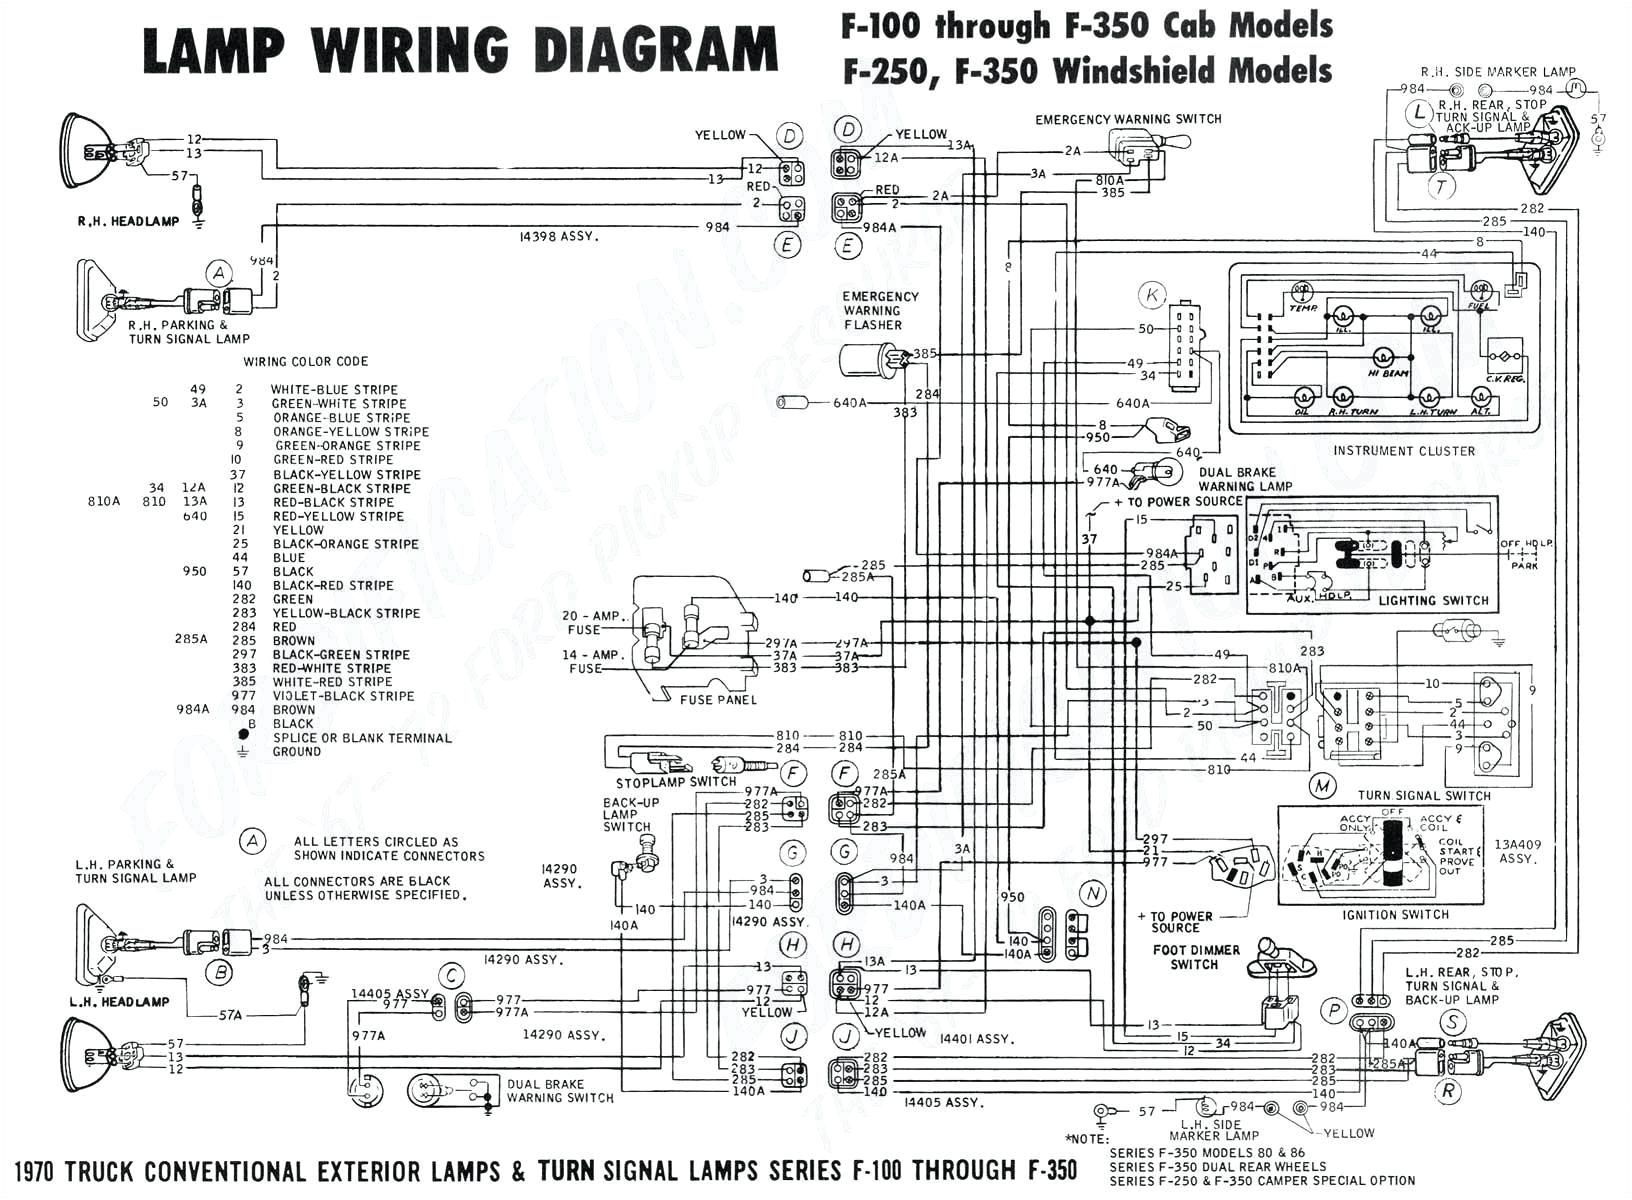 engine wire diagram 1977 wiring diagram expert 318 engine wire harness diagram